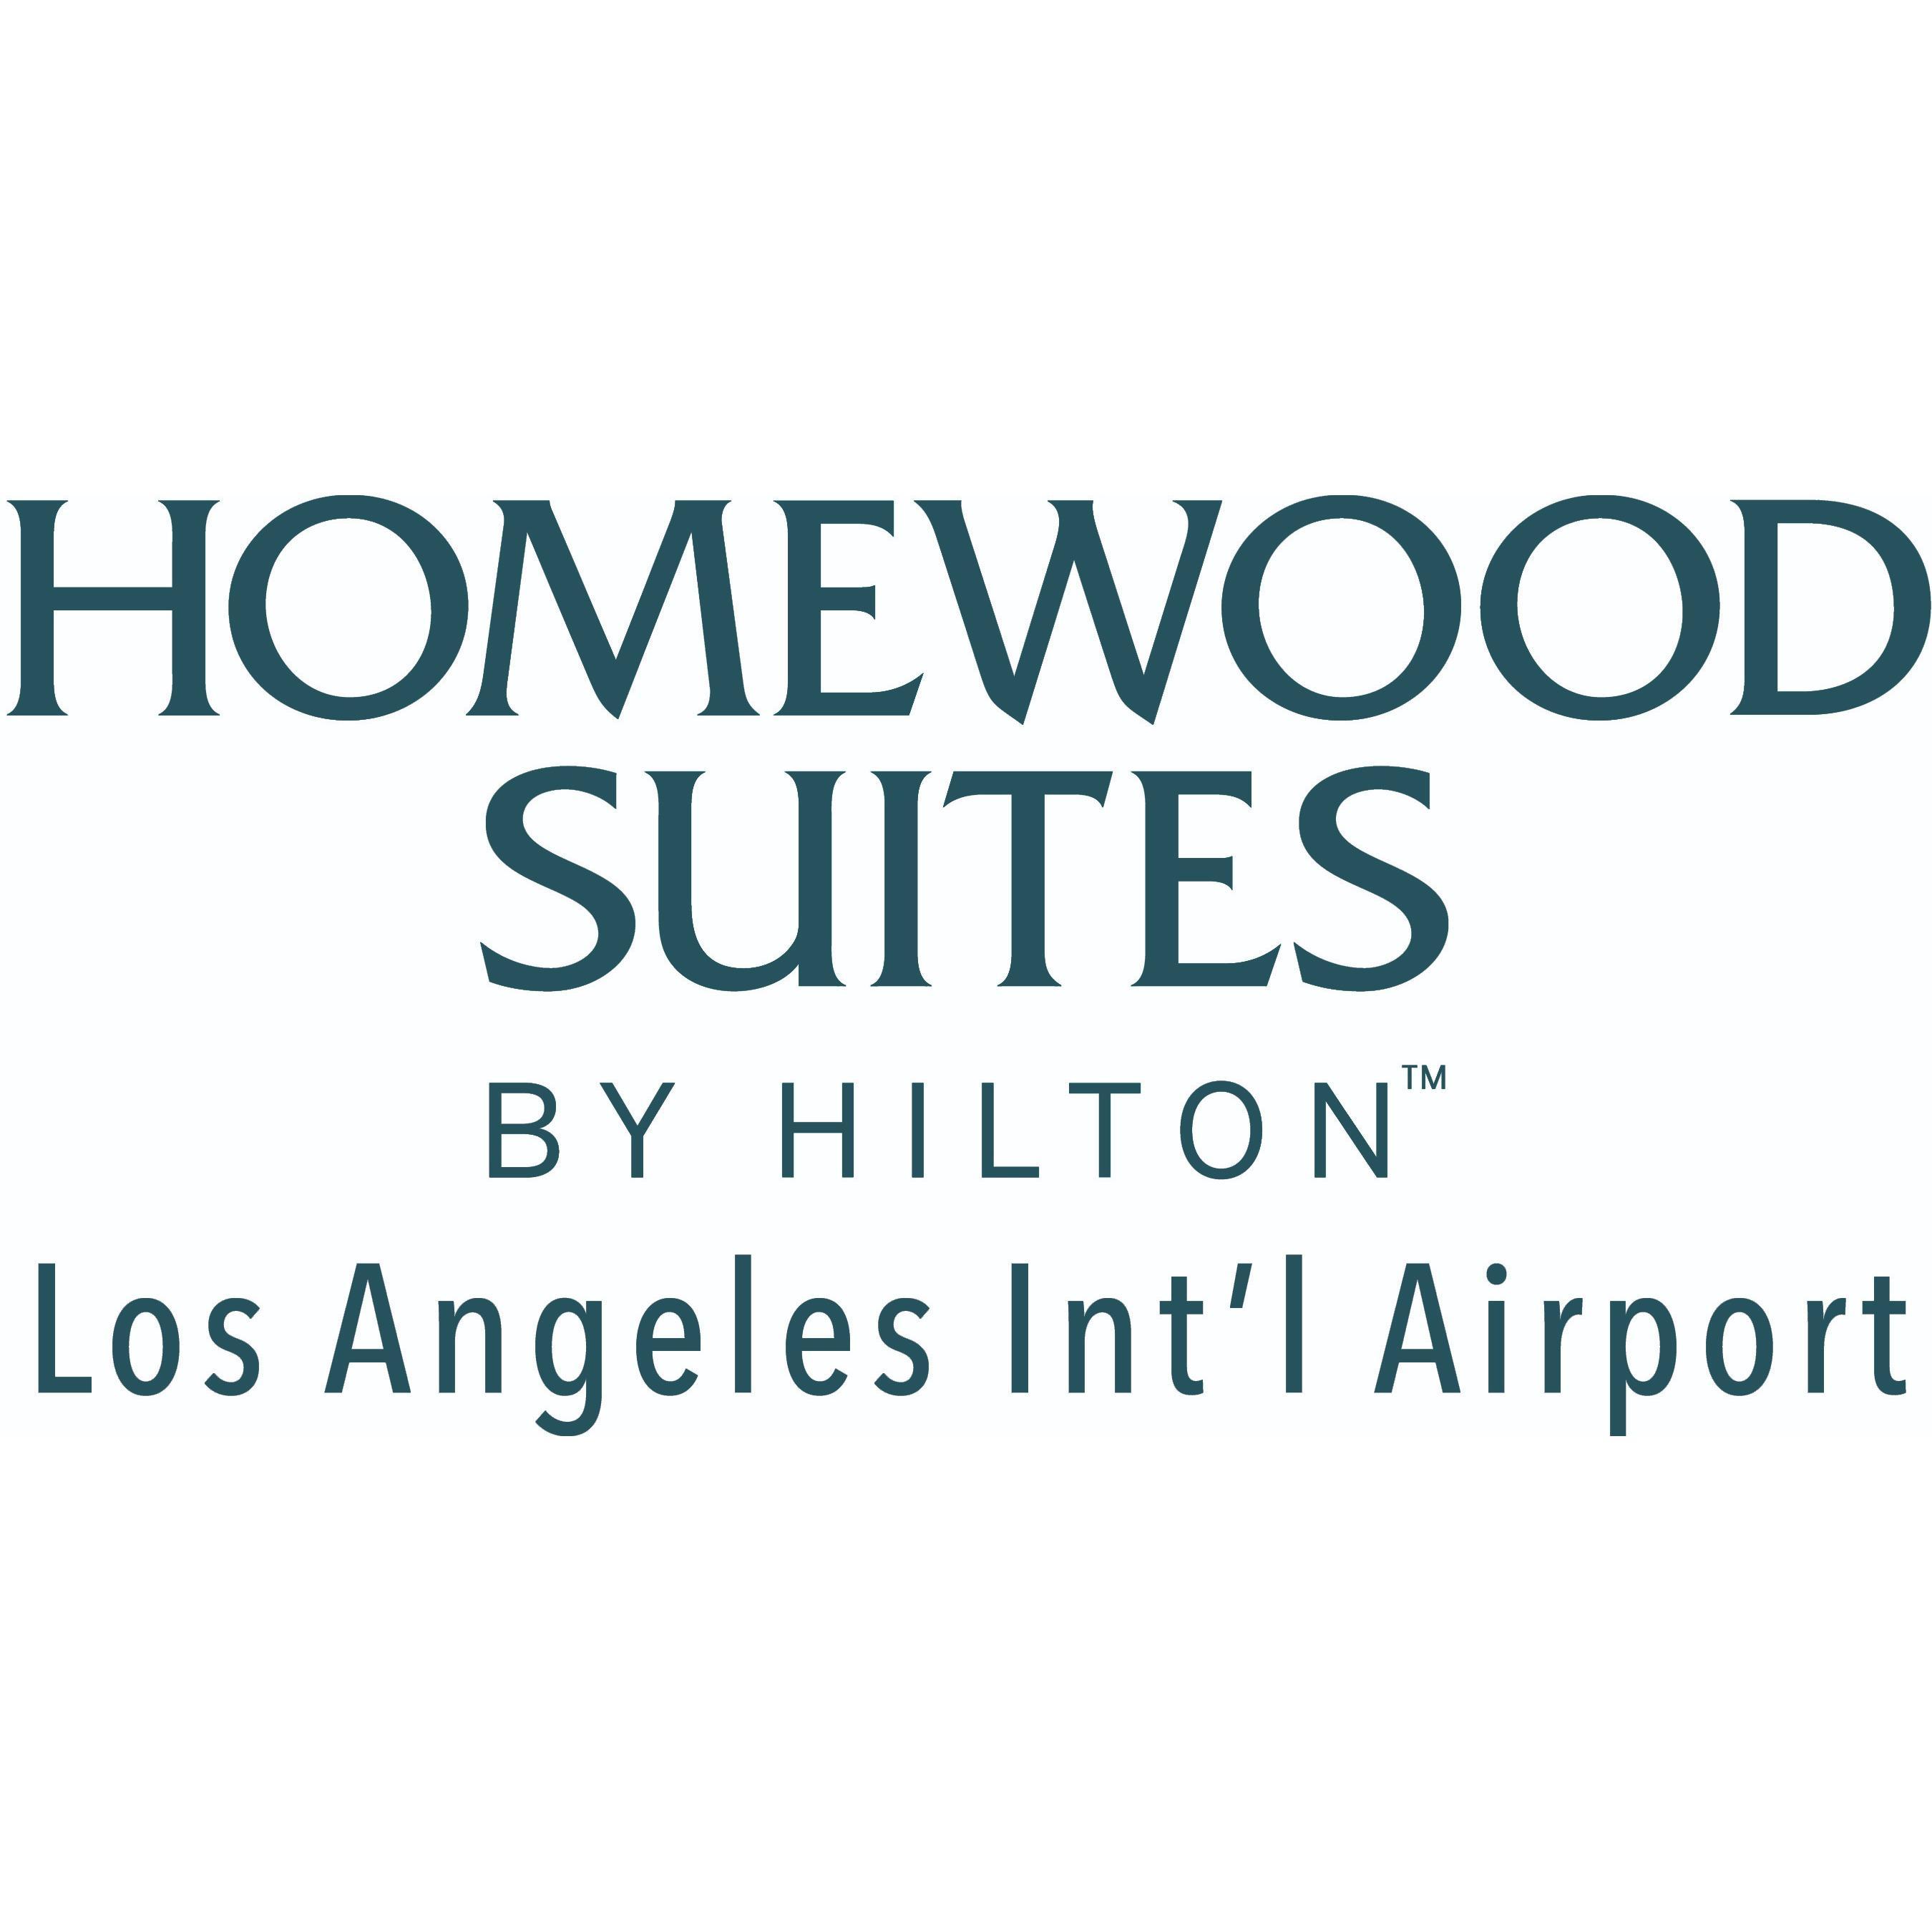 Homewood Suites by Hilton Los Angeles International Airport